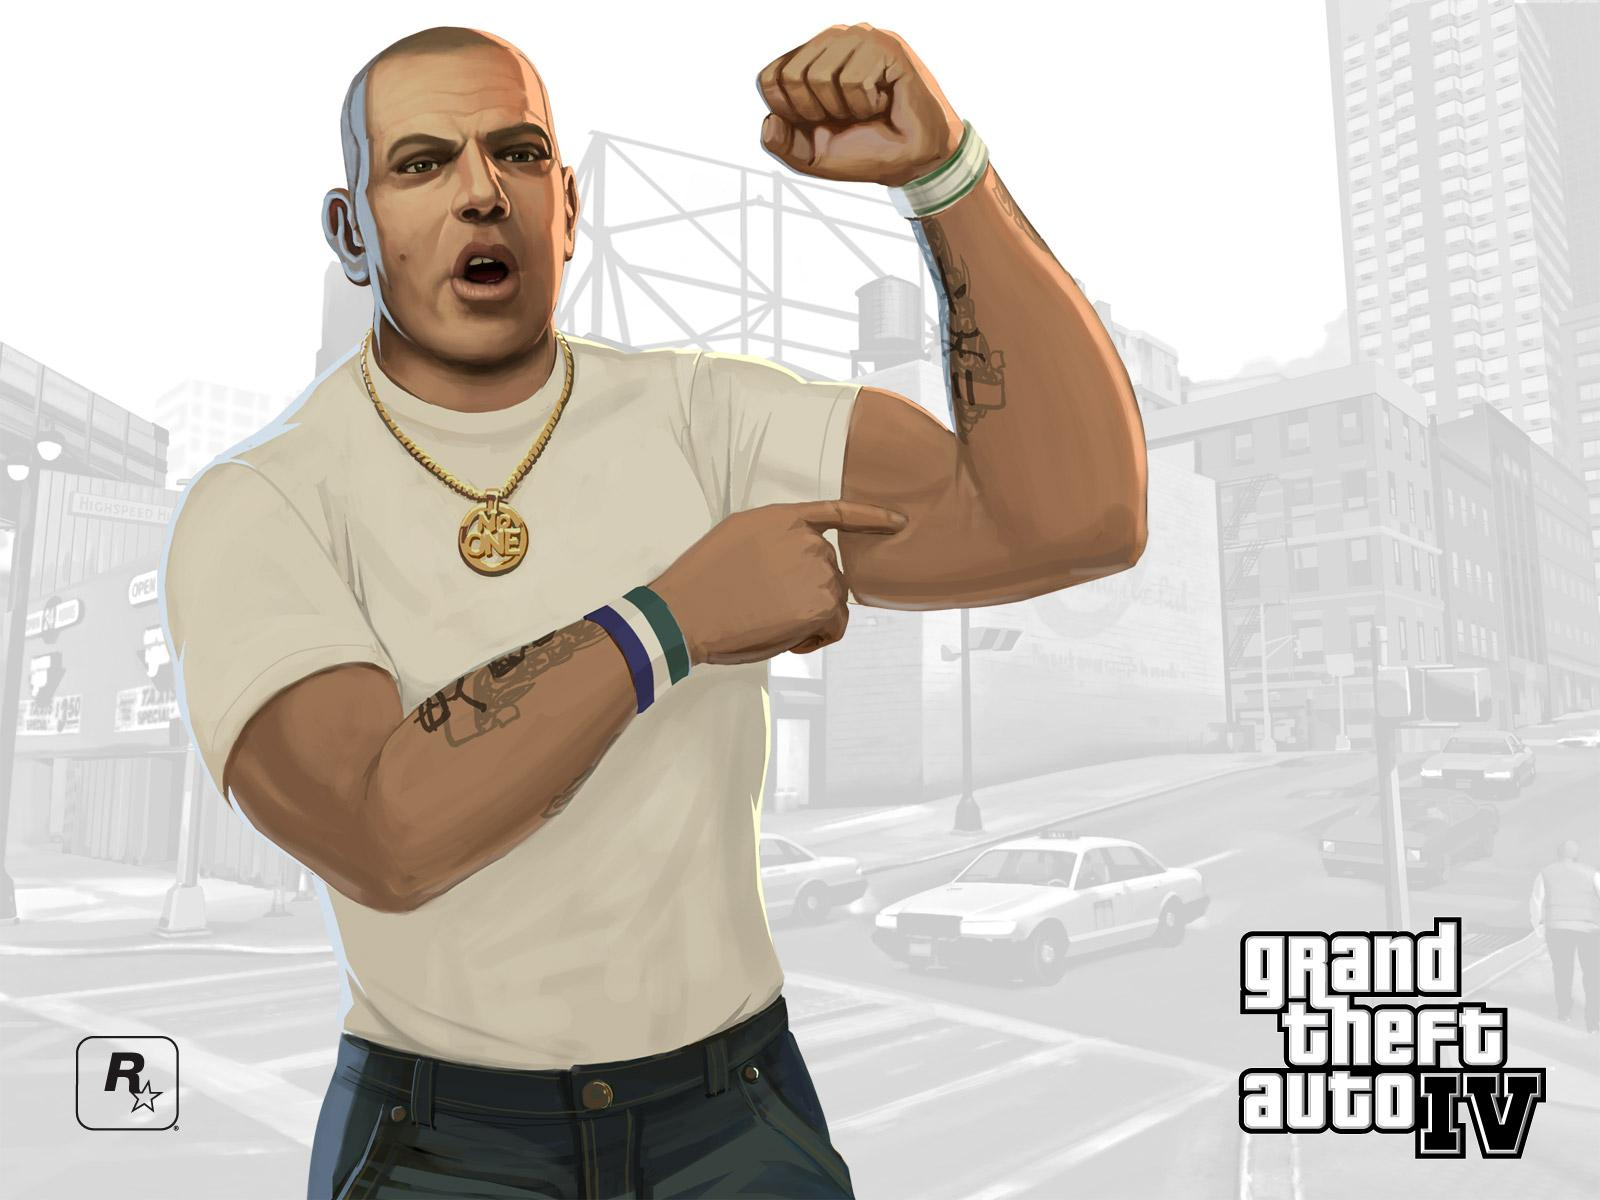 grand_theft_auto_4-16.jpg - Grand Theft Auto 4